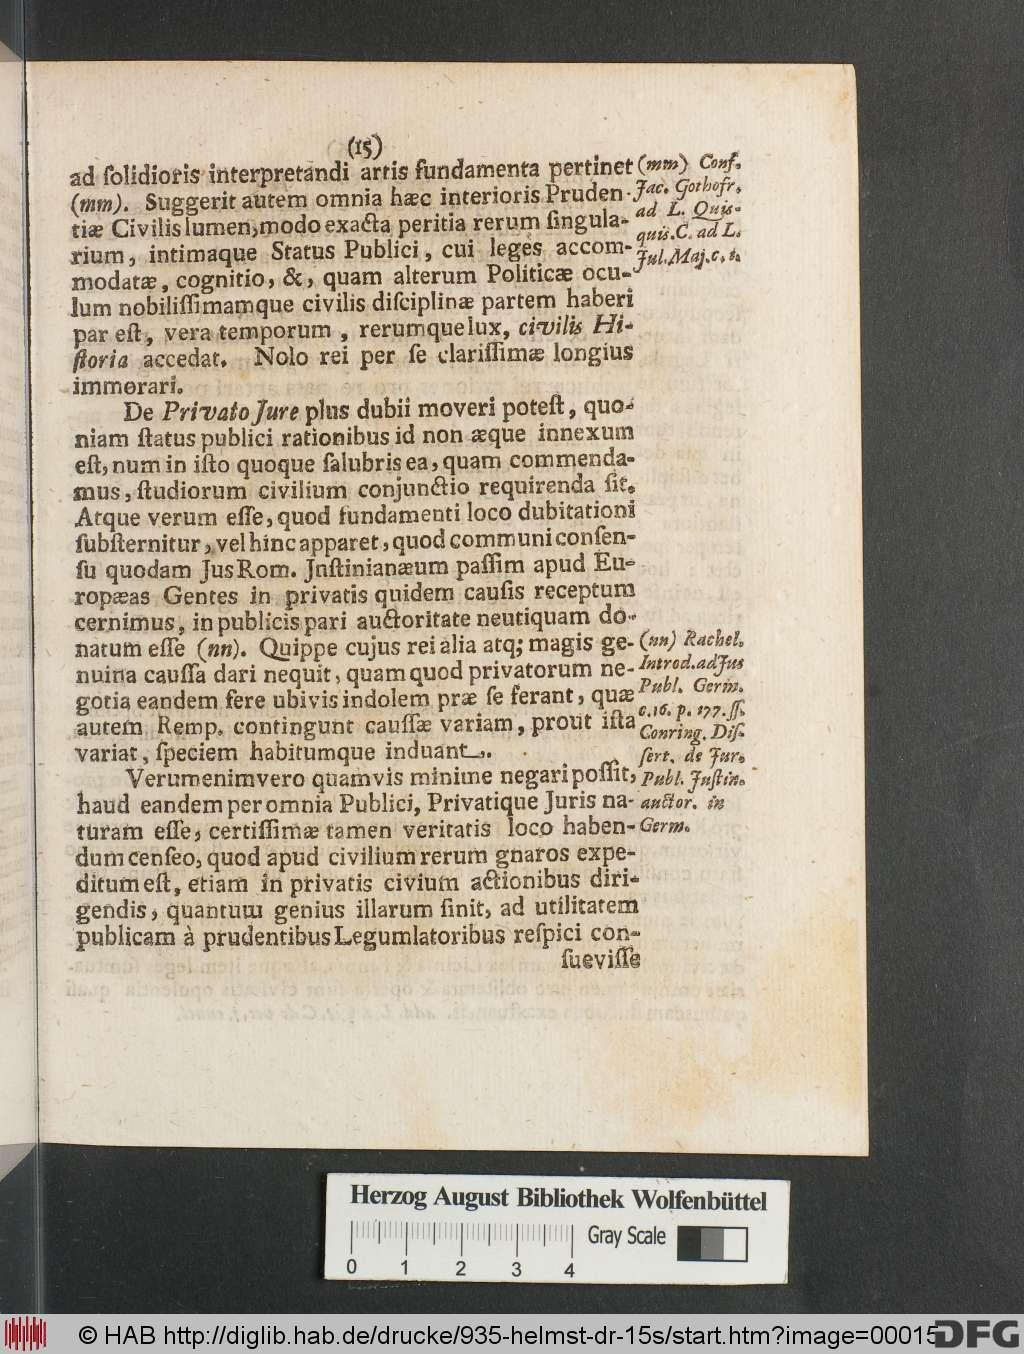 https://diglib.hab.de/drucke/935-helmst-dr-15s/00015.jpg